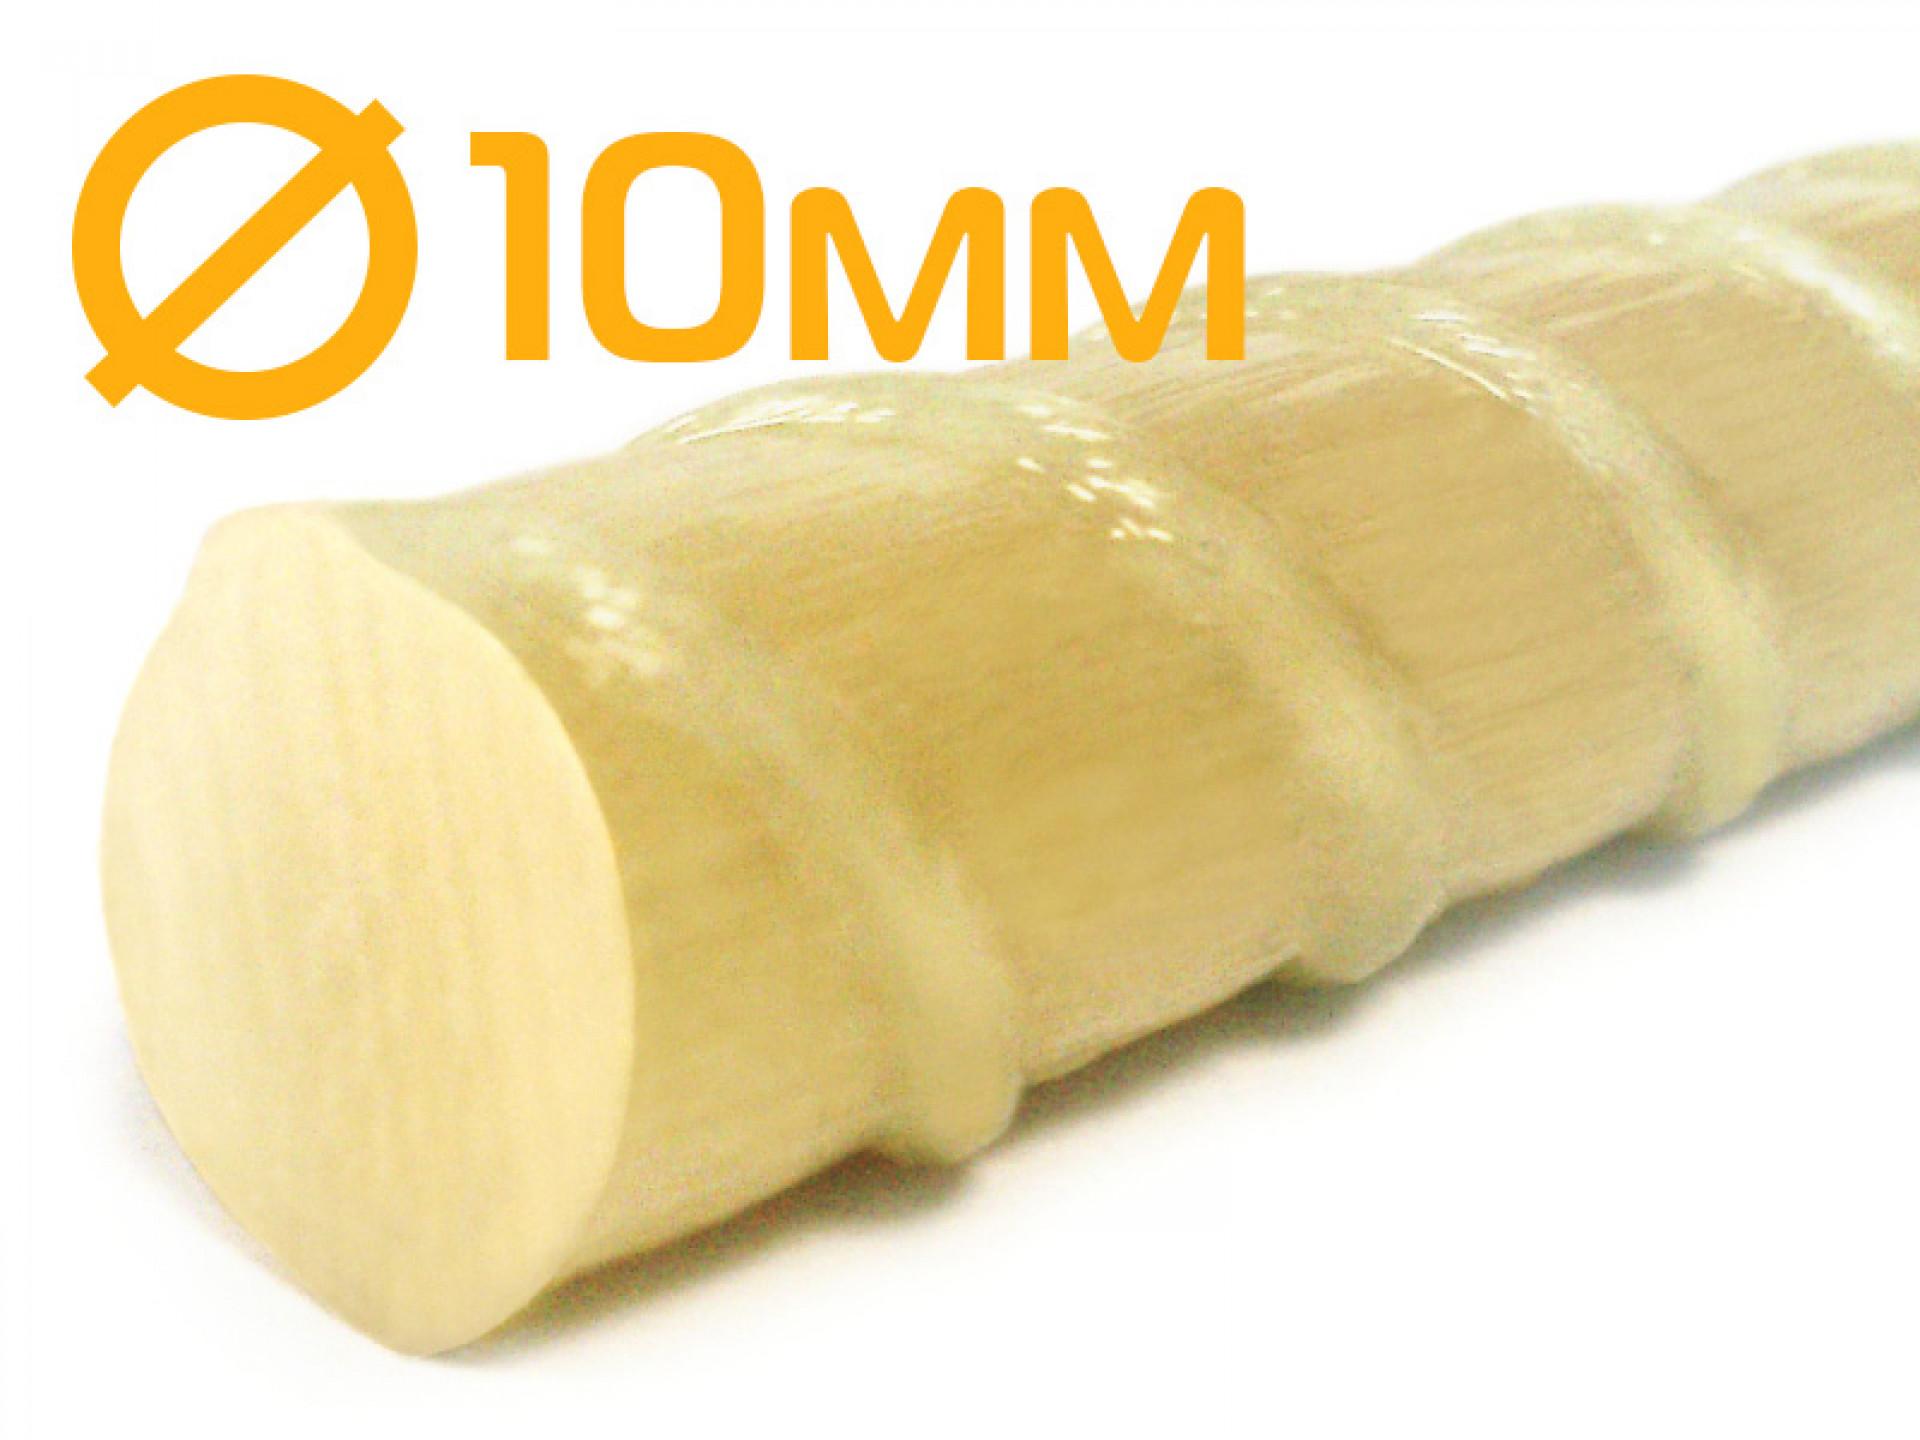 Композитная арматура ТУ 10 миллиметров от производителя в Тамбове